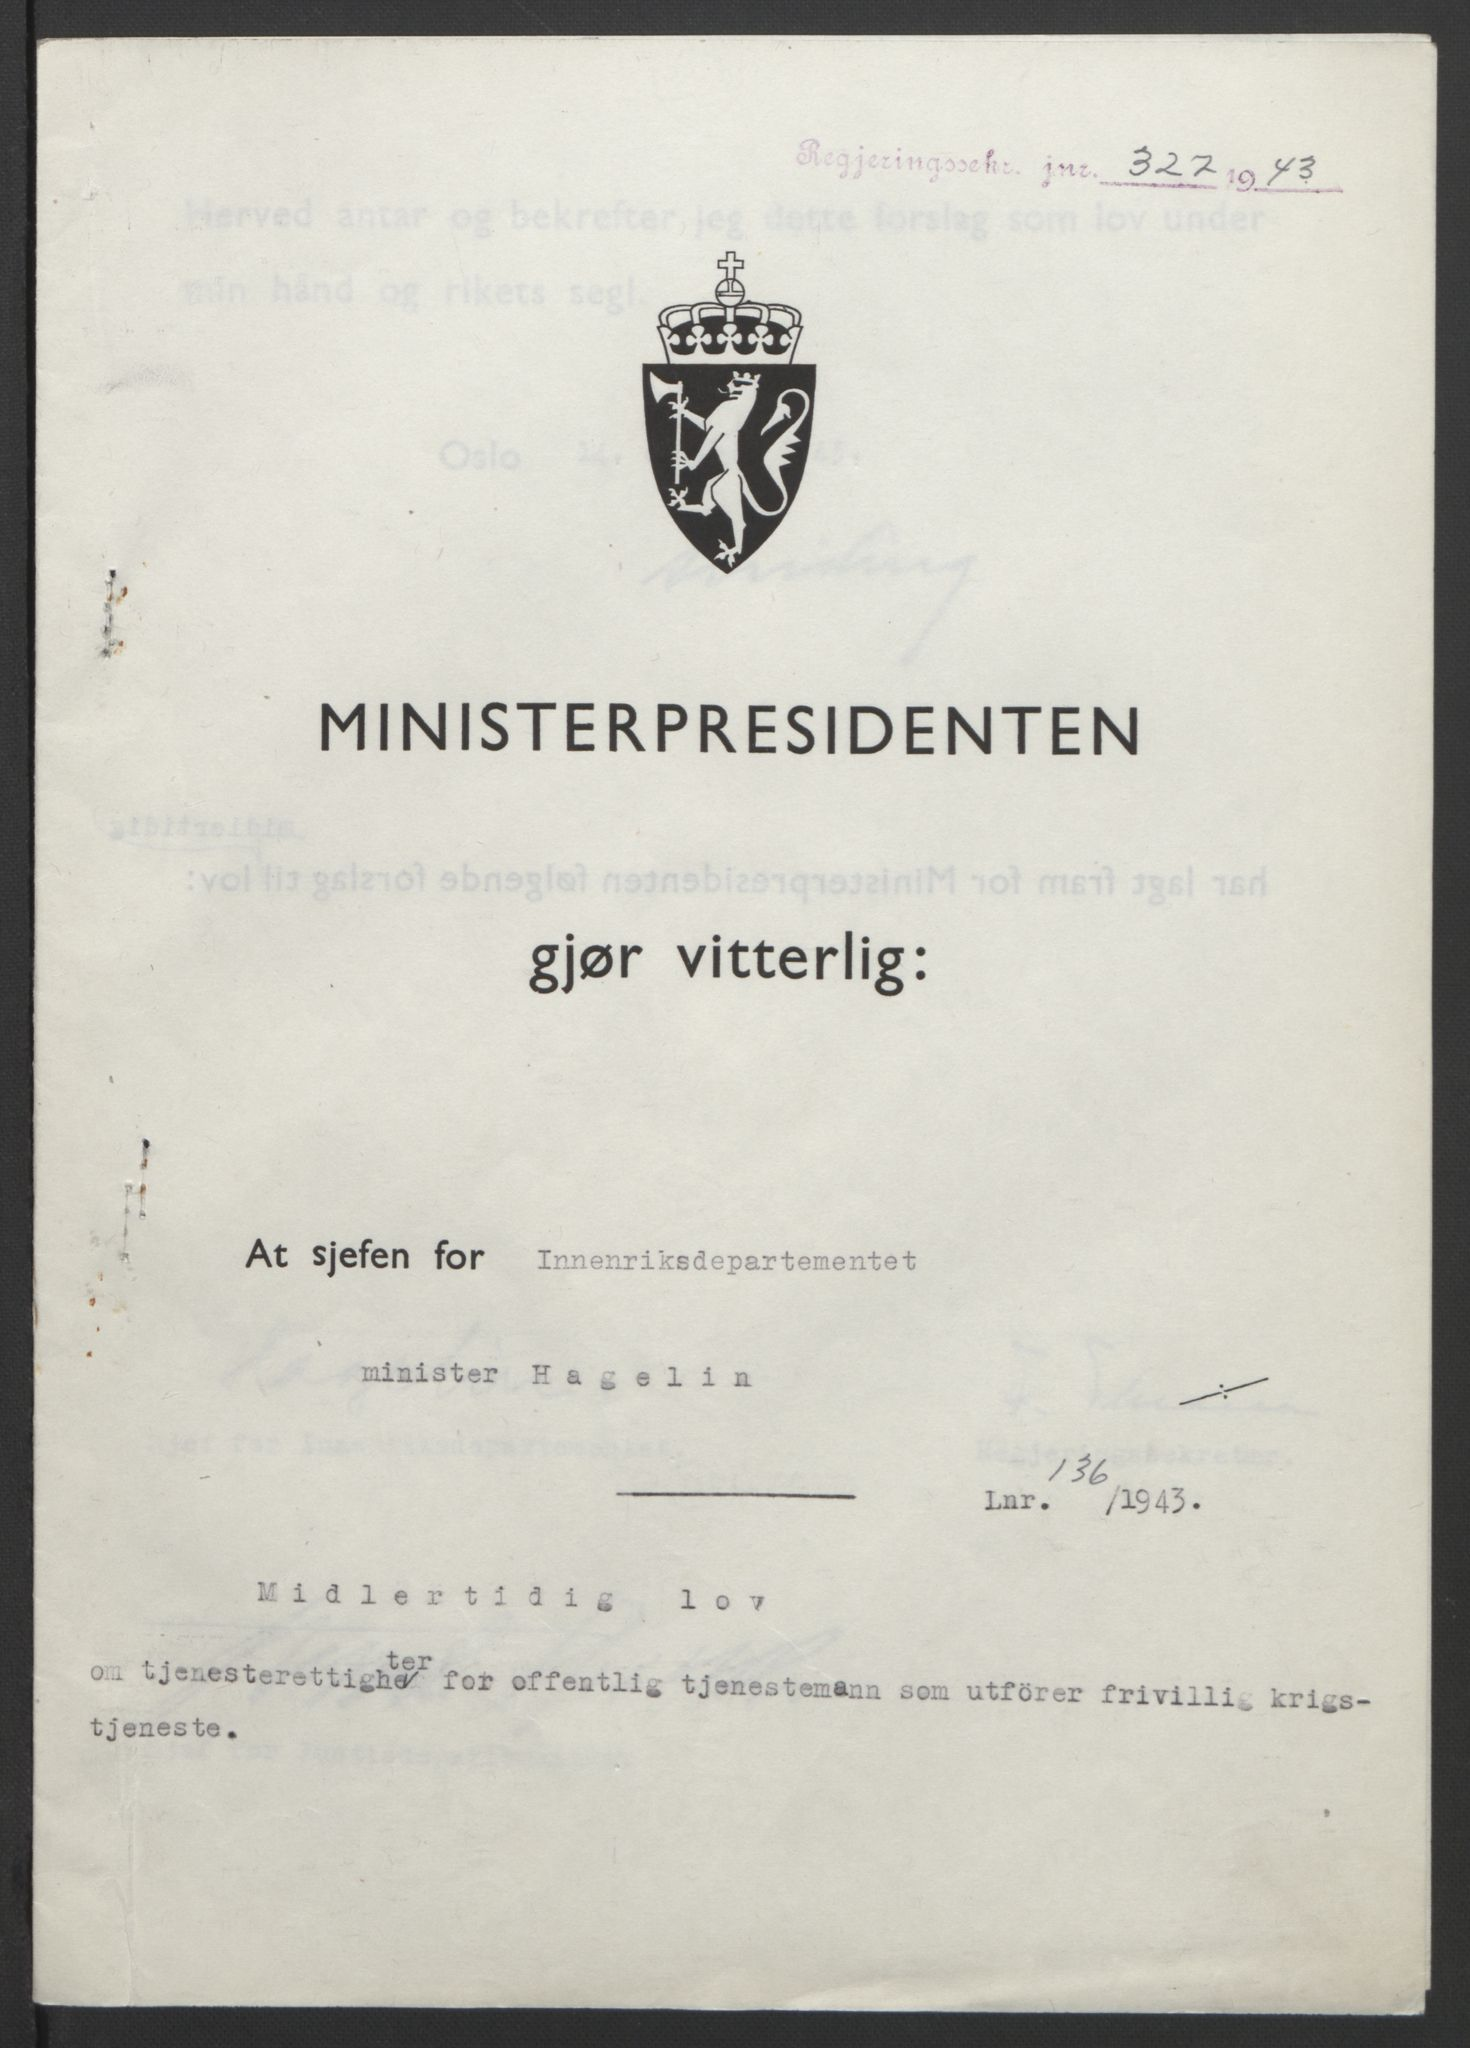 RA, NS-administrasjonen 1940-1945 (Statsrådsekretariatet, de kommisariske statsråder mm), D/Db/L0099: Lover, 1943, s. 632